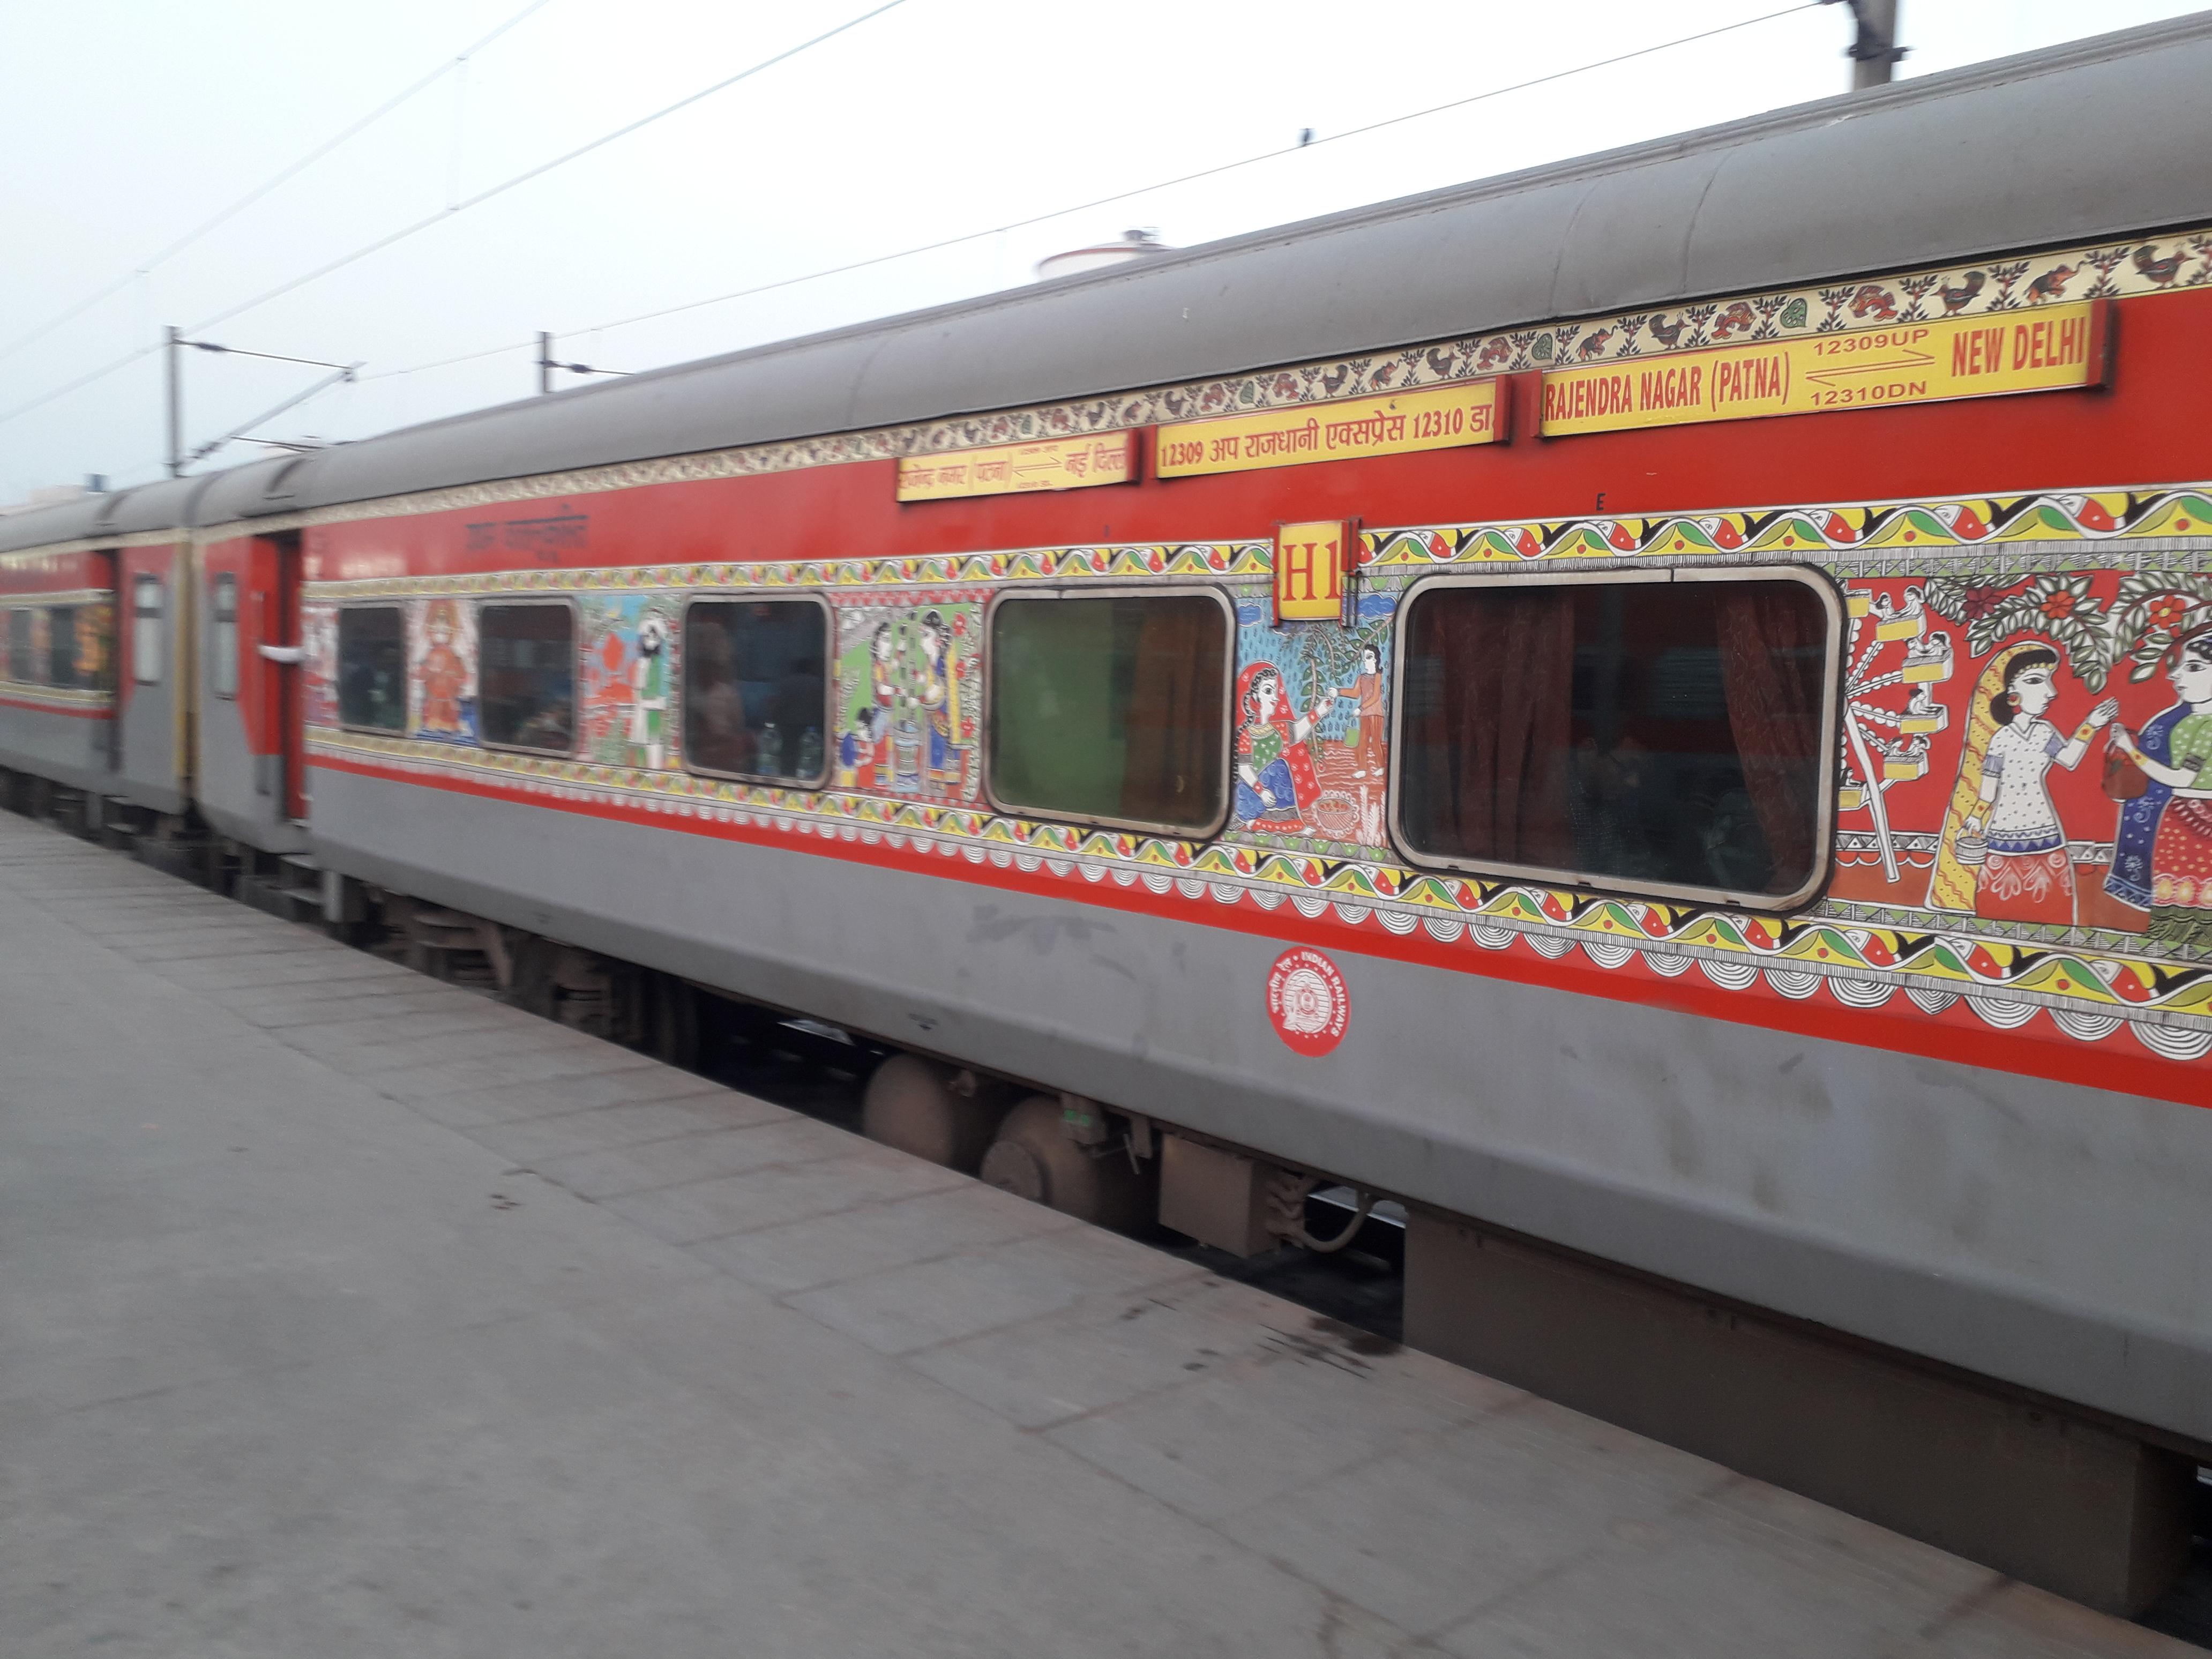 Rajdhani Express - Wikipedia